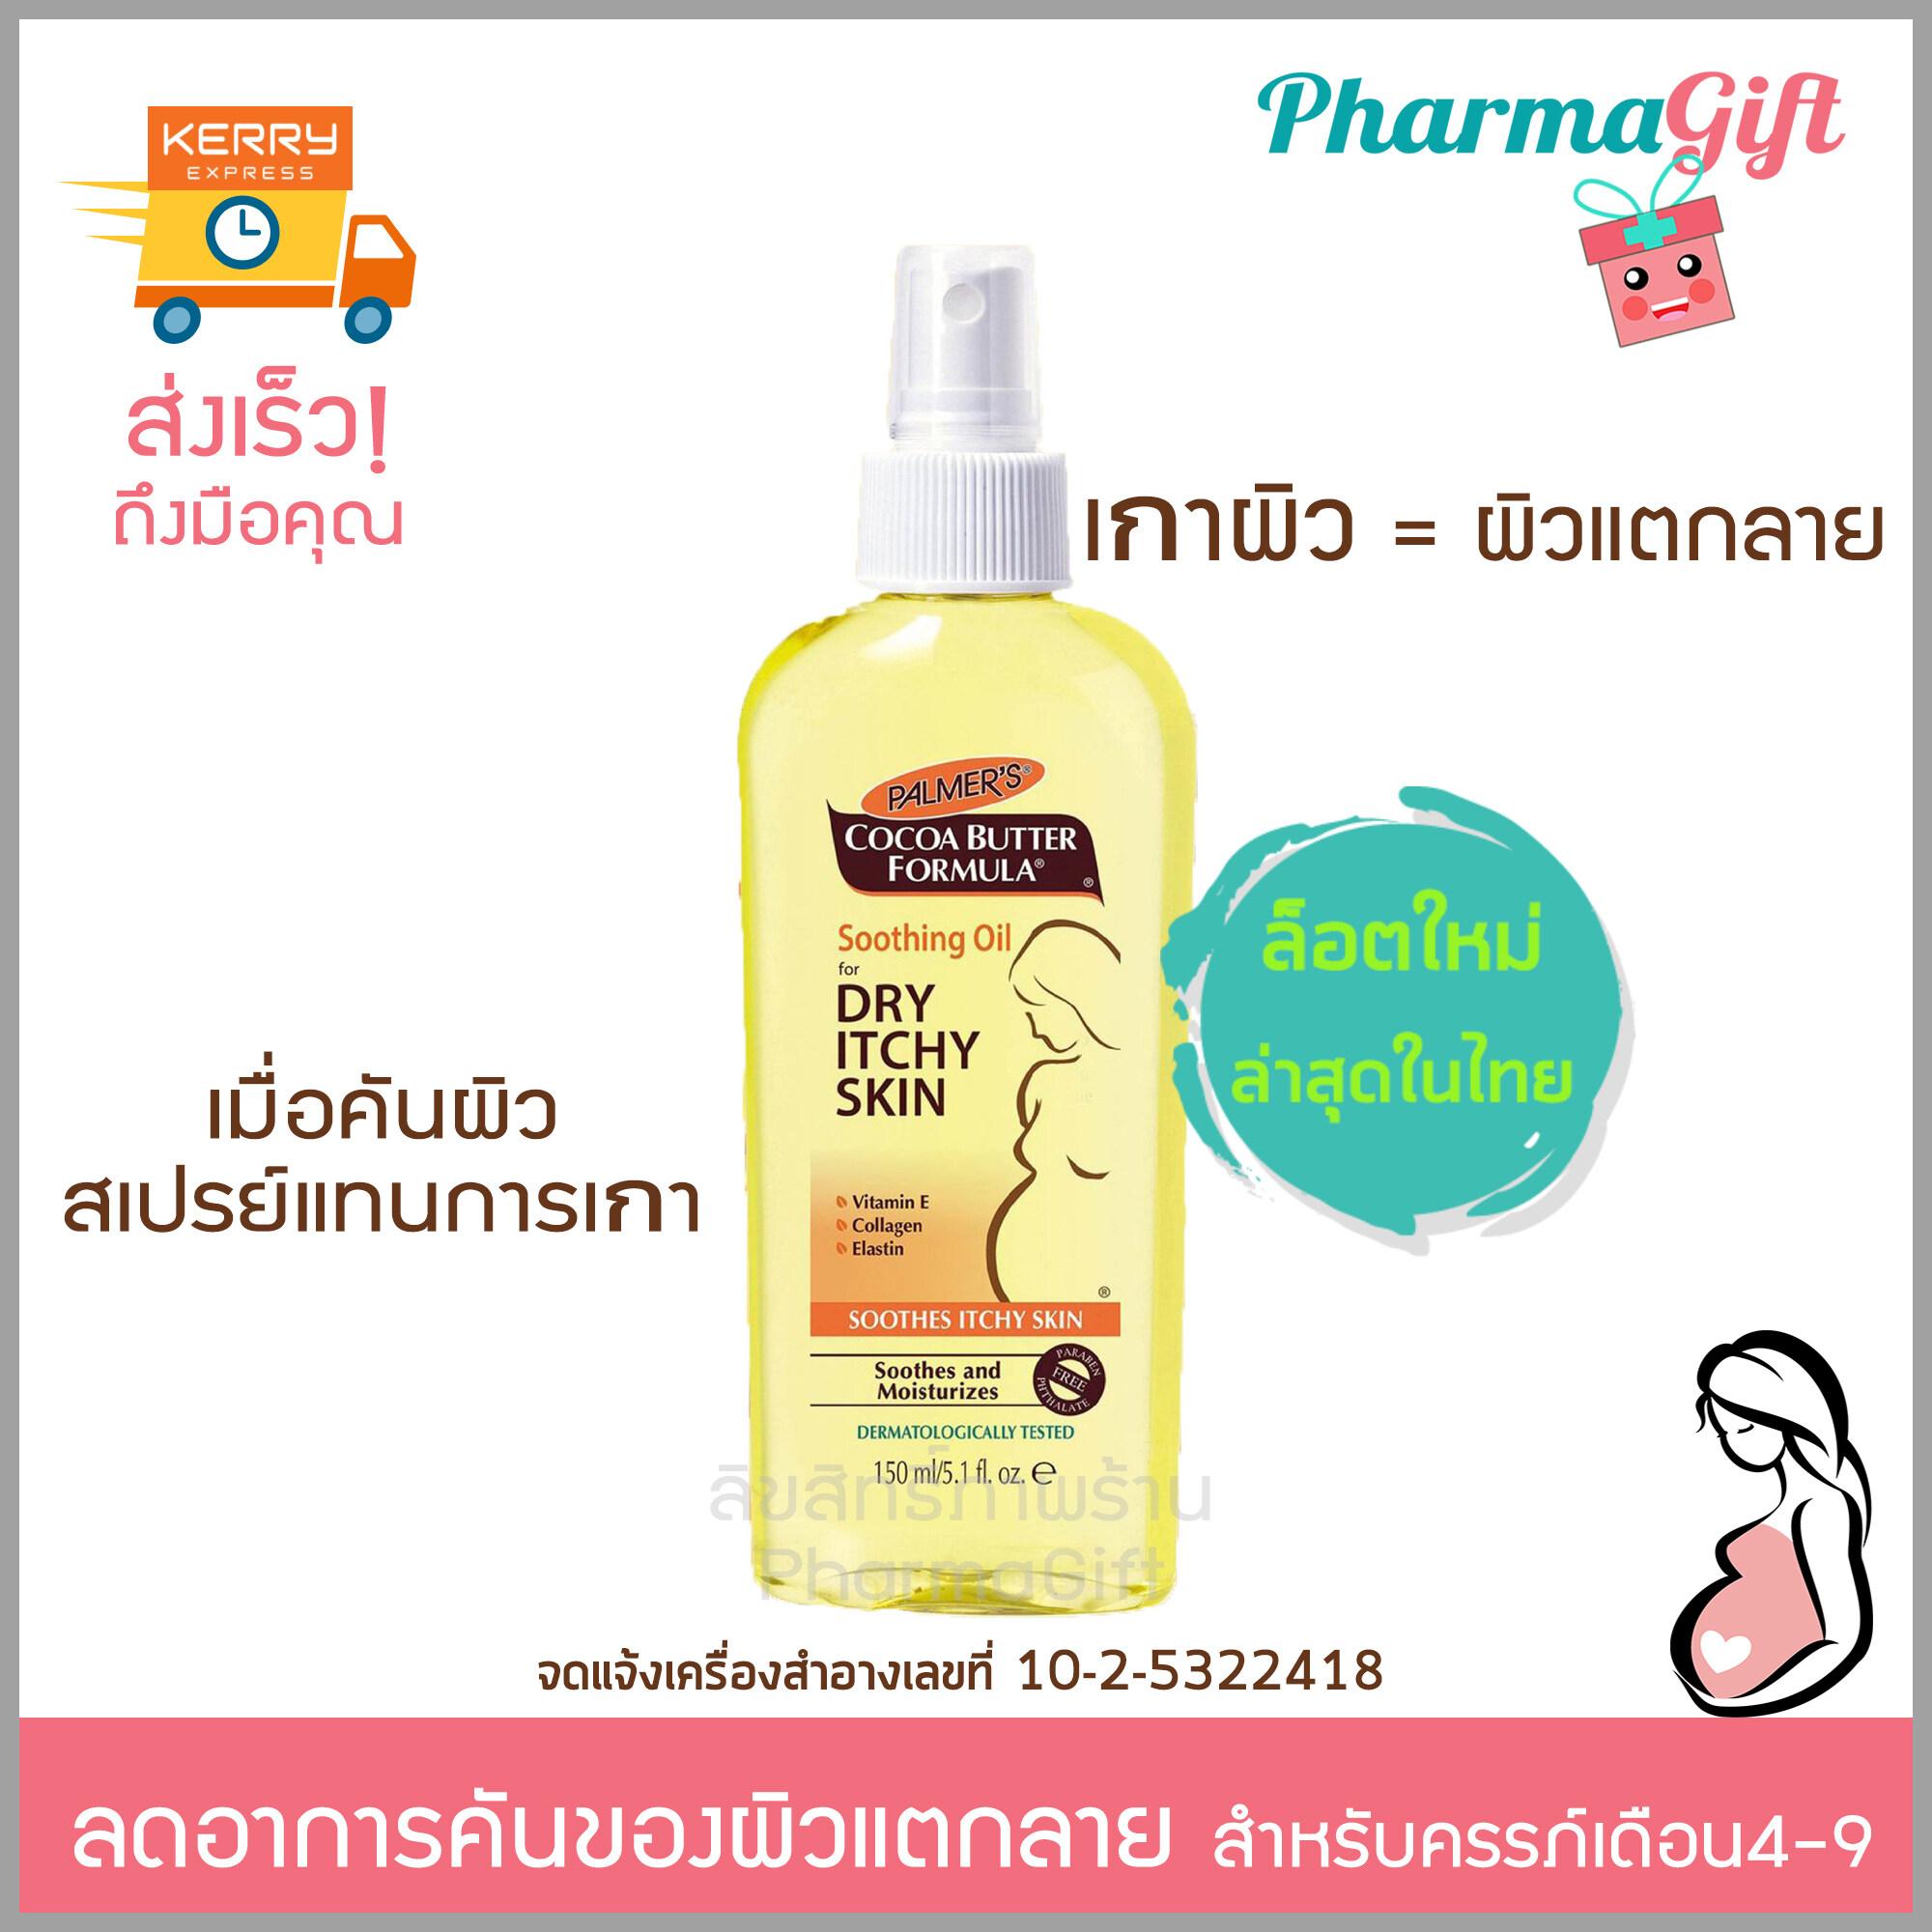 Palmer 's Soothing oil for dry itchy skin 150 ml ปาล์มเมอร์ สเปรย์ออย ใช้แทนการเกา ดูแลพิเศษสำหรับผิวแตกลาย ปลอดภัยทั้งแม่และลูกน้อย